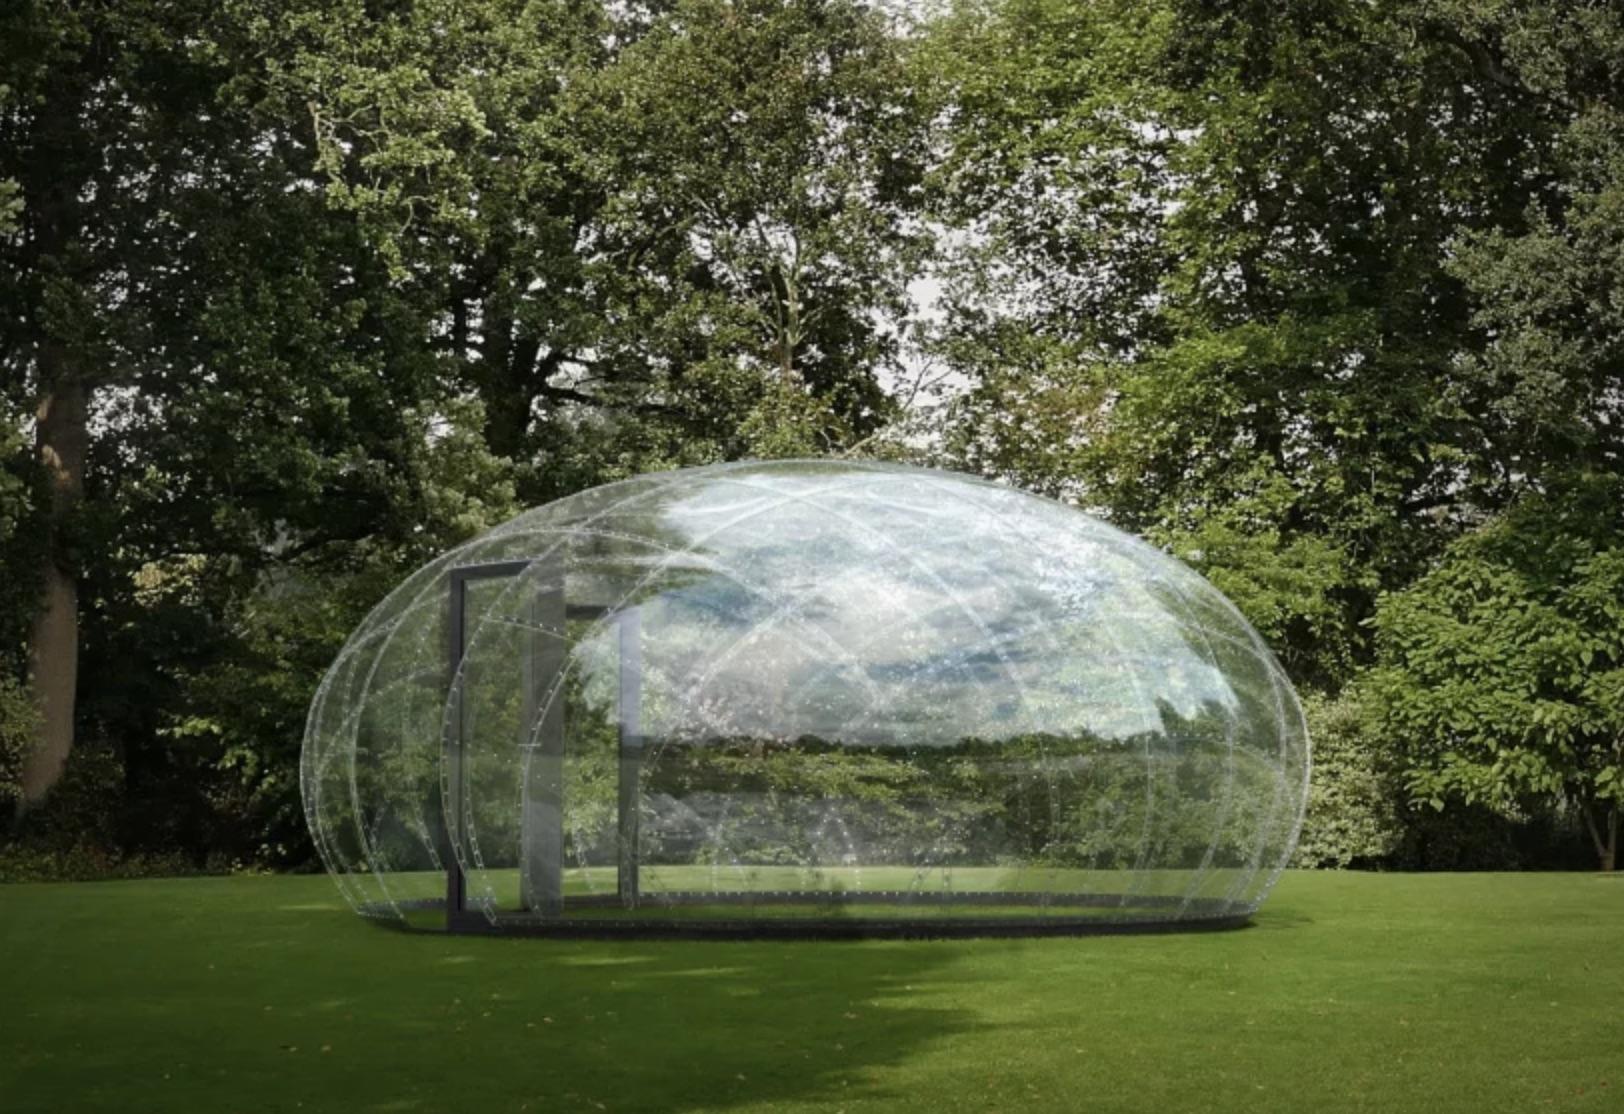 Transparent pavilion looks like a massive water droplet